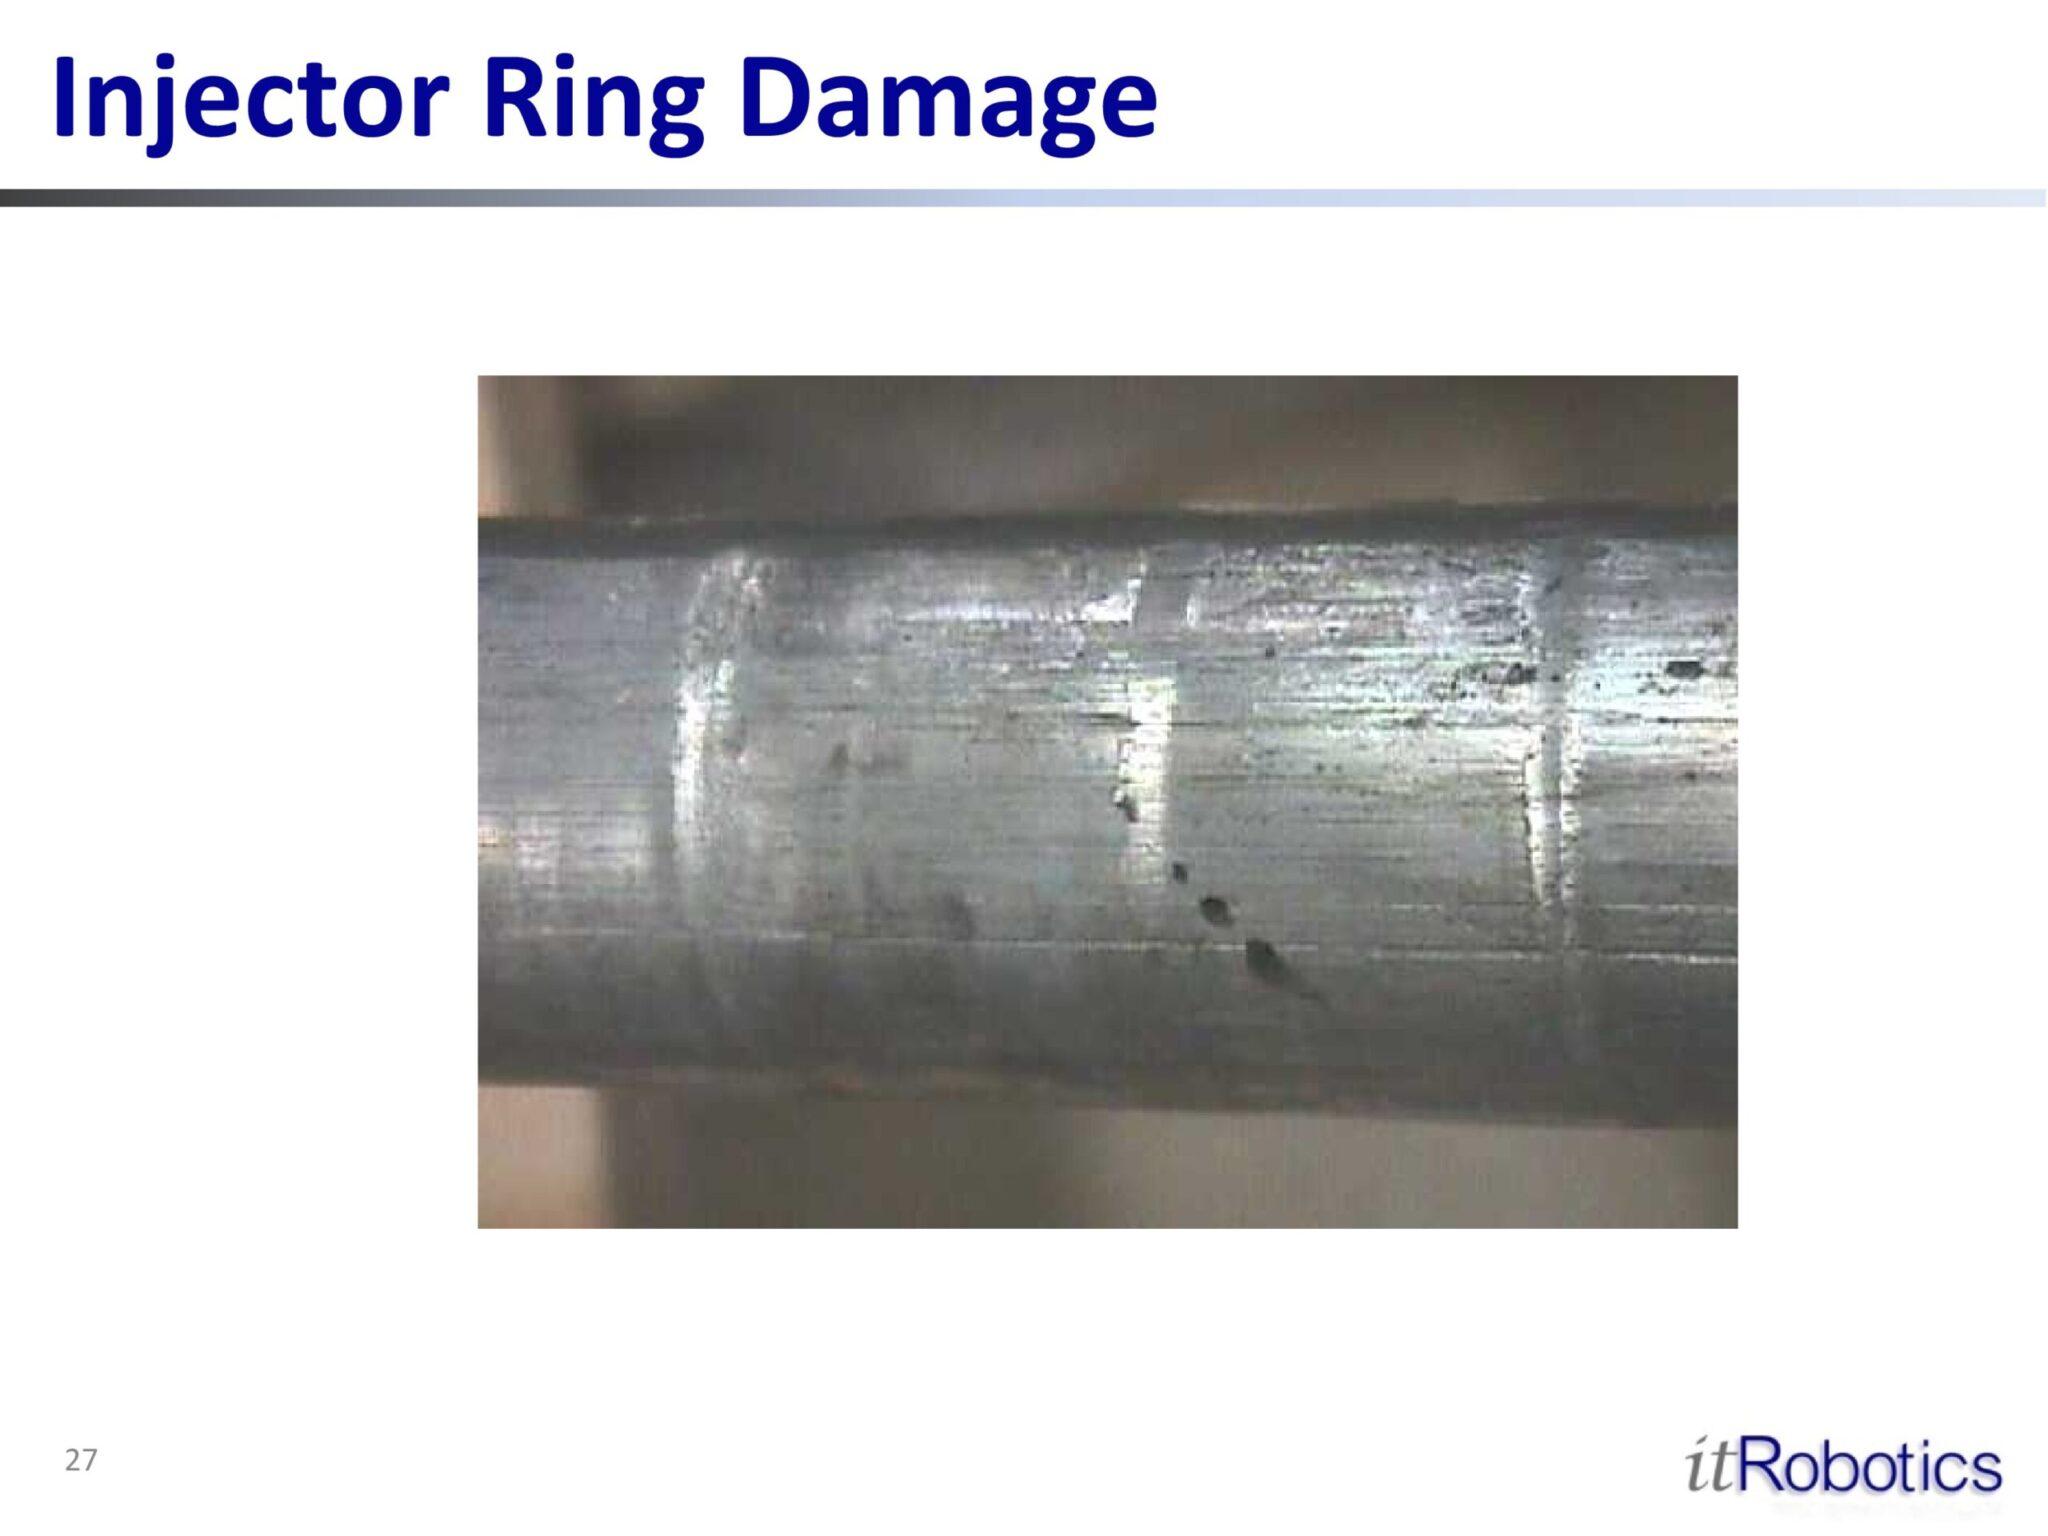 Injector Ring Damage